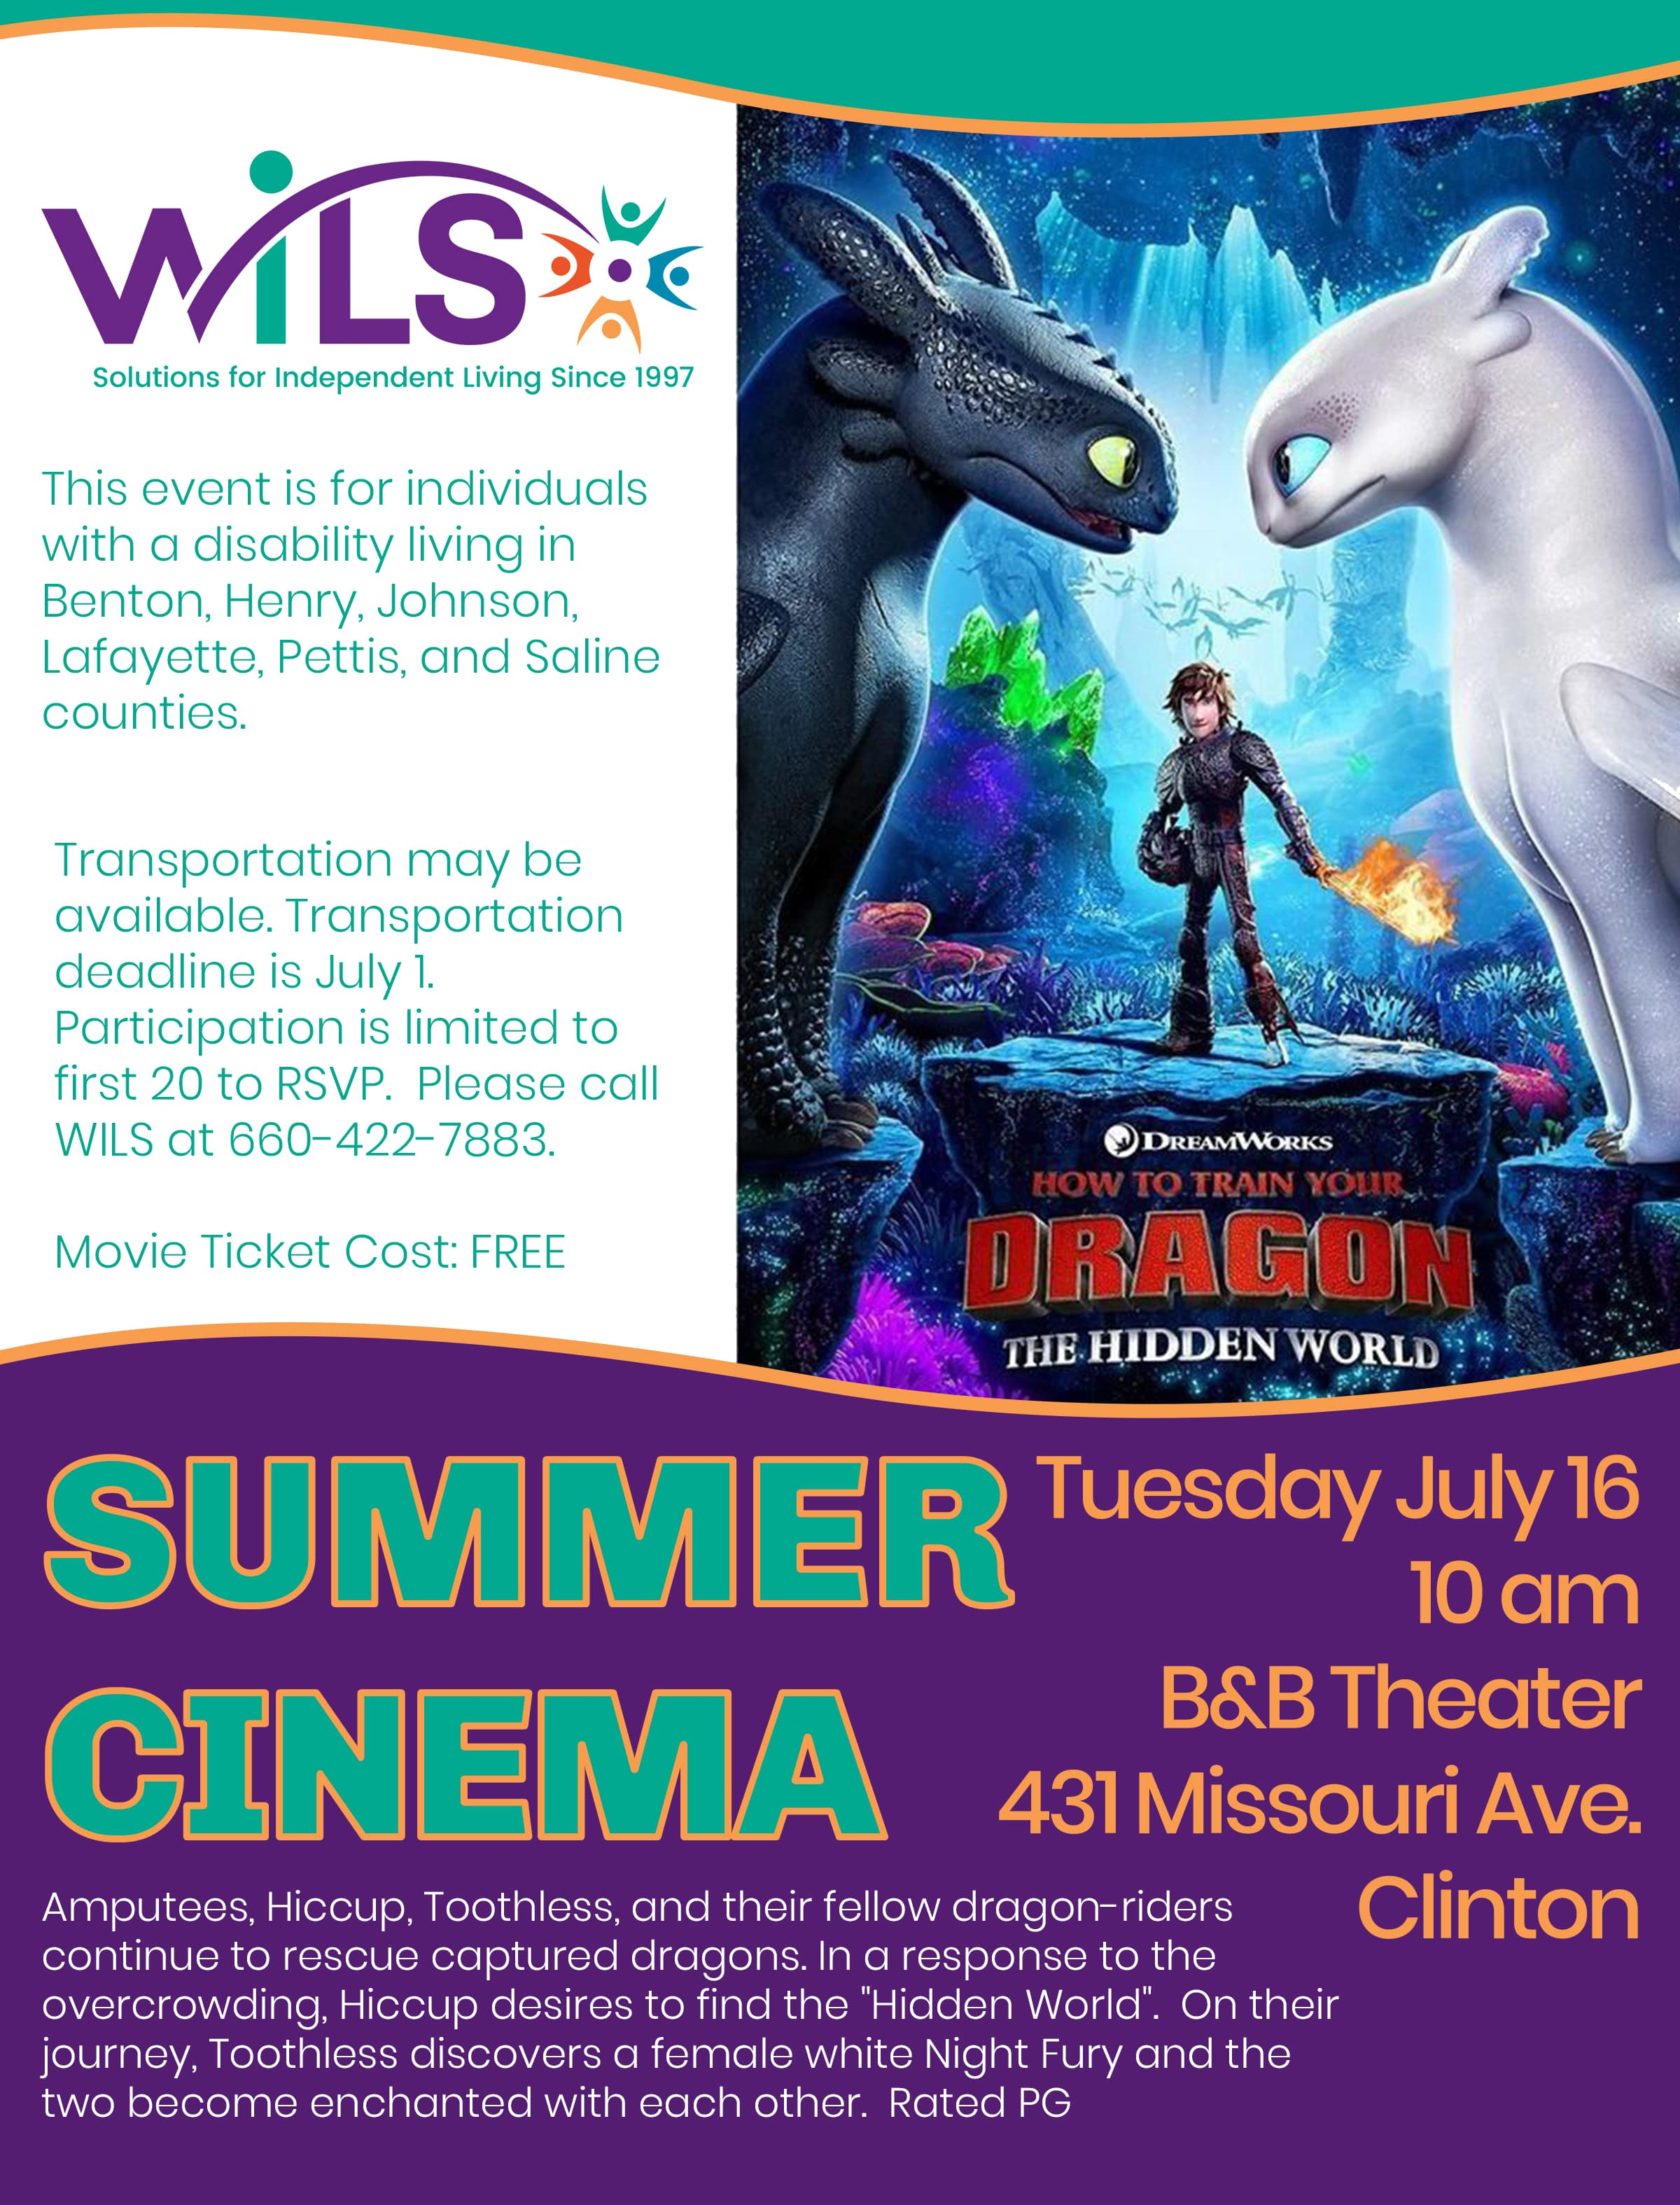 Summer Cinema @ B&B Theater